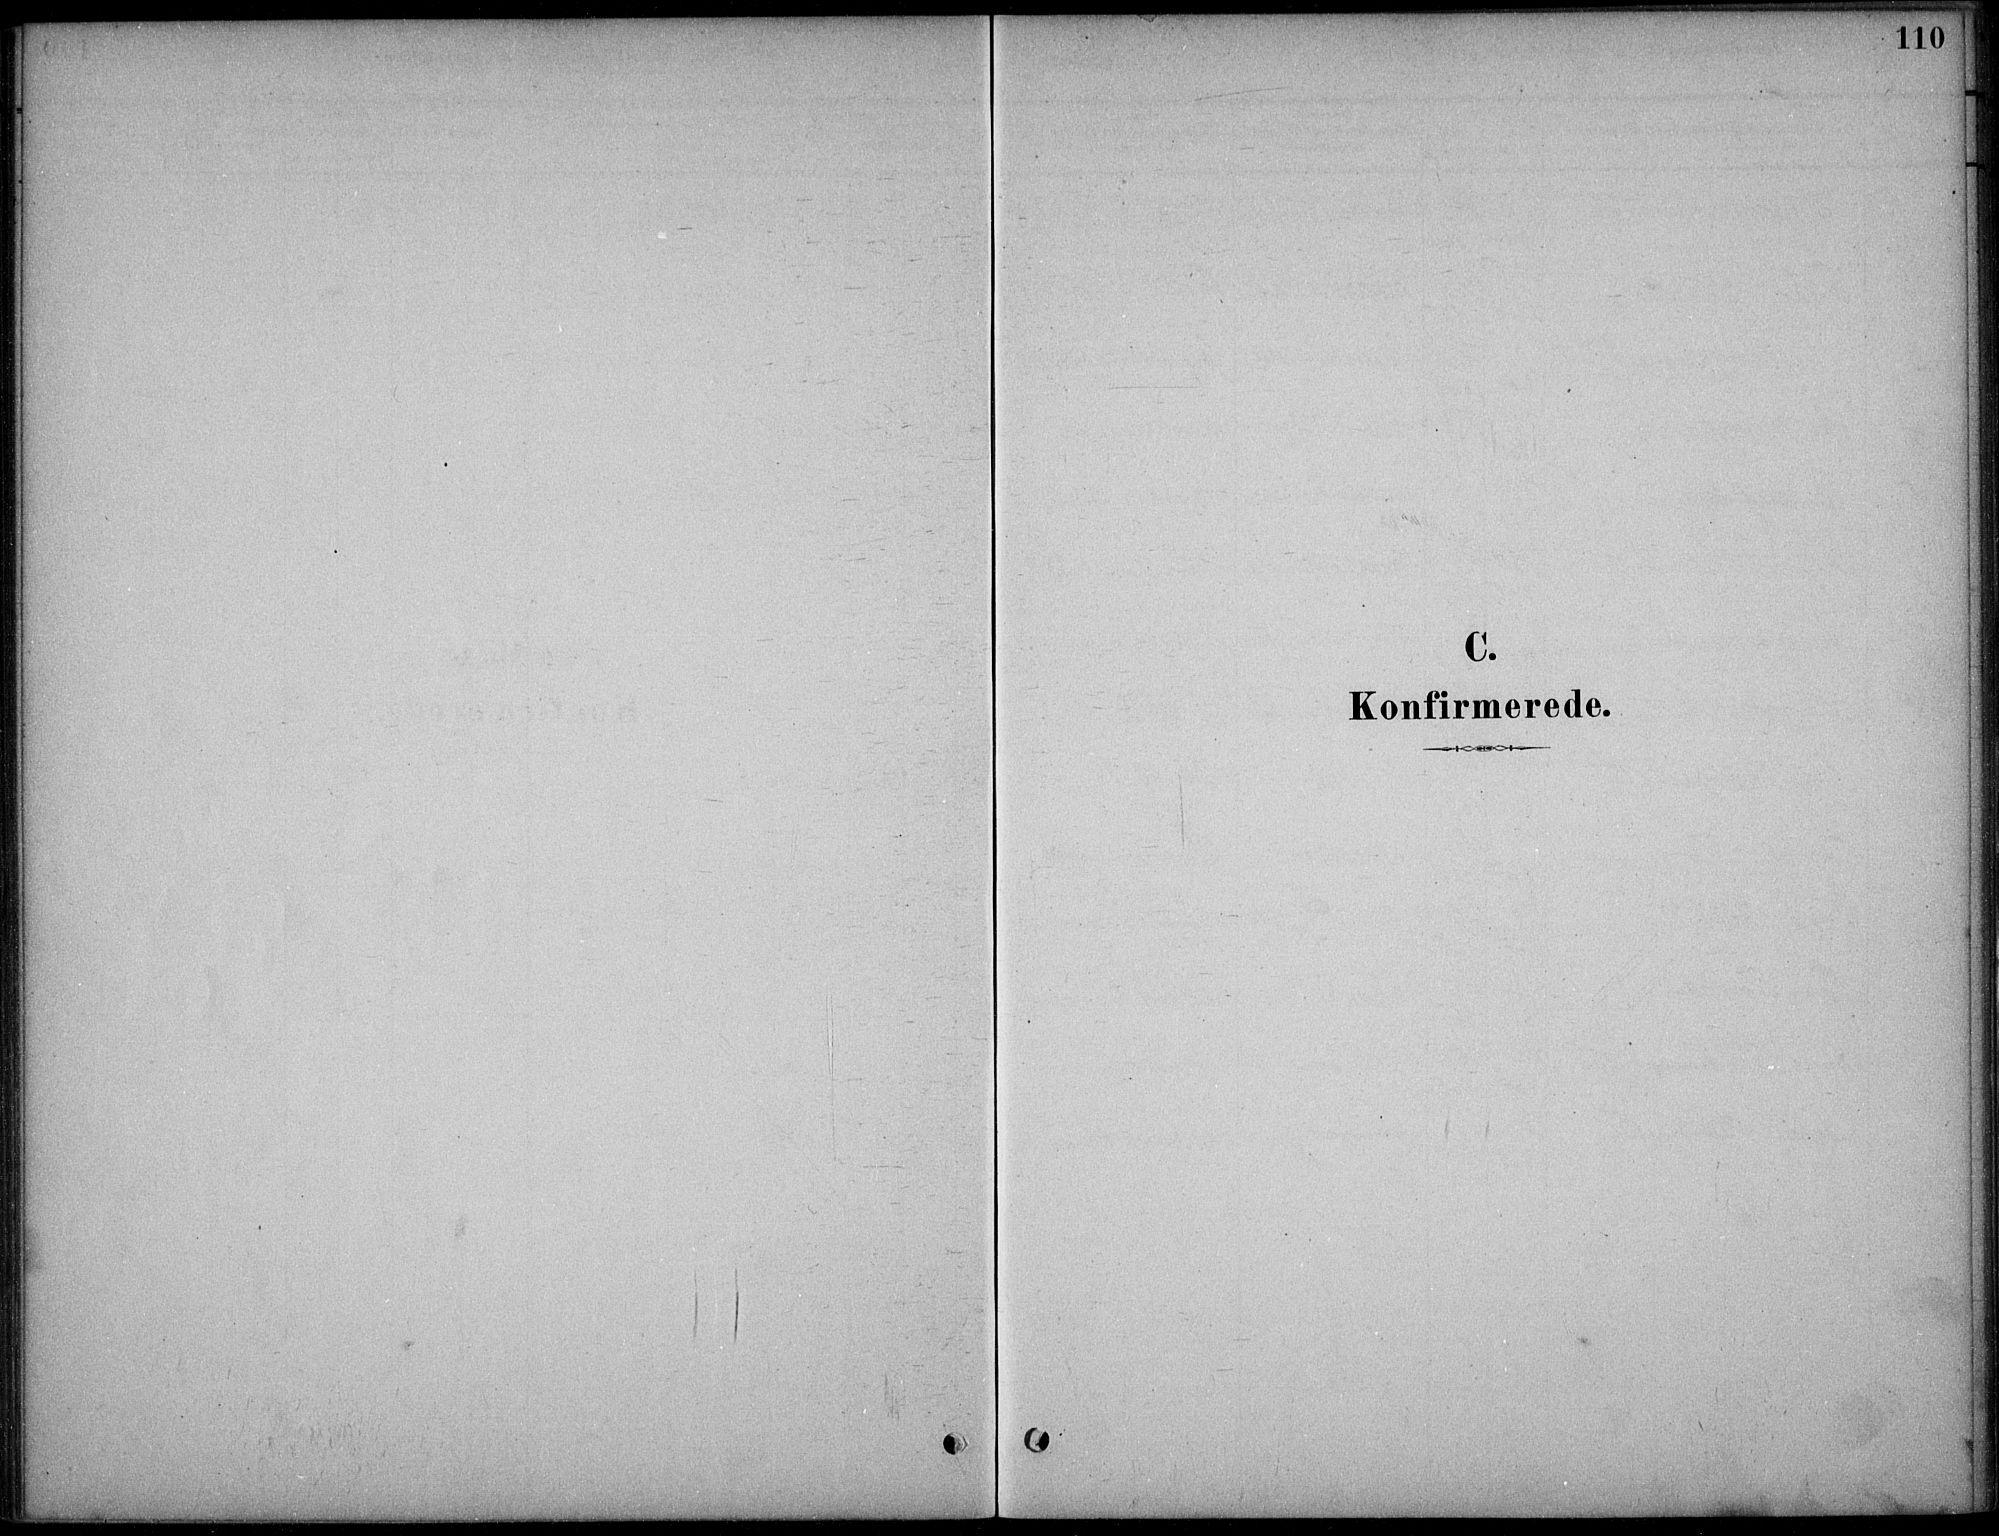 SAKO, Hjartdal kirkebøker, F/Fc/L0002: Ministerialbok nr. III 2, 1880-1936, s. 110